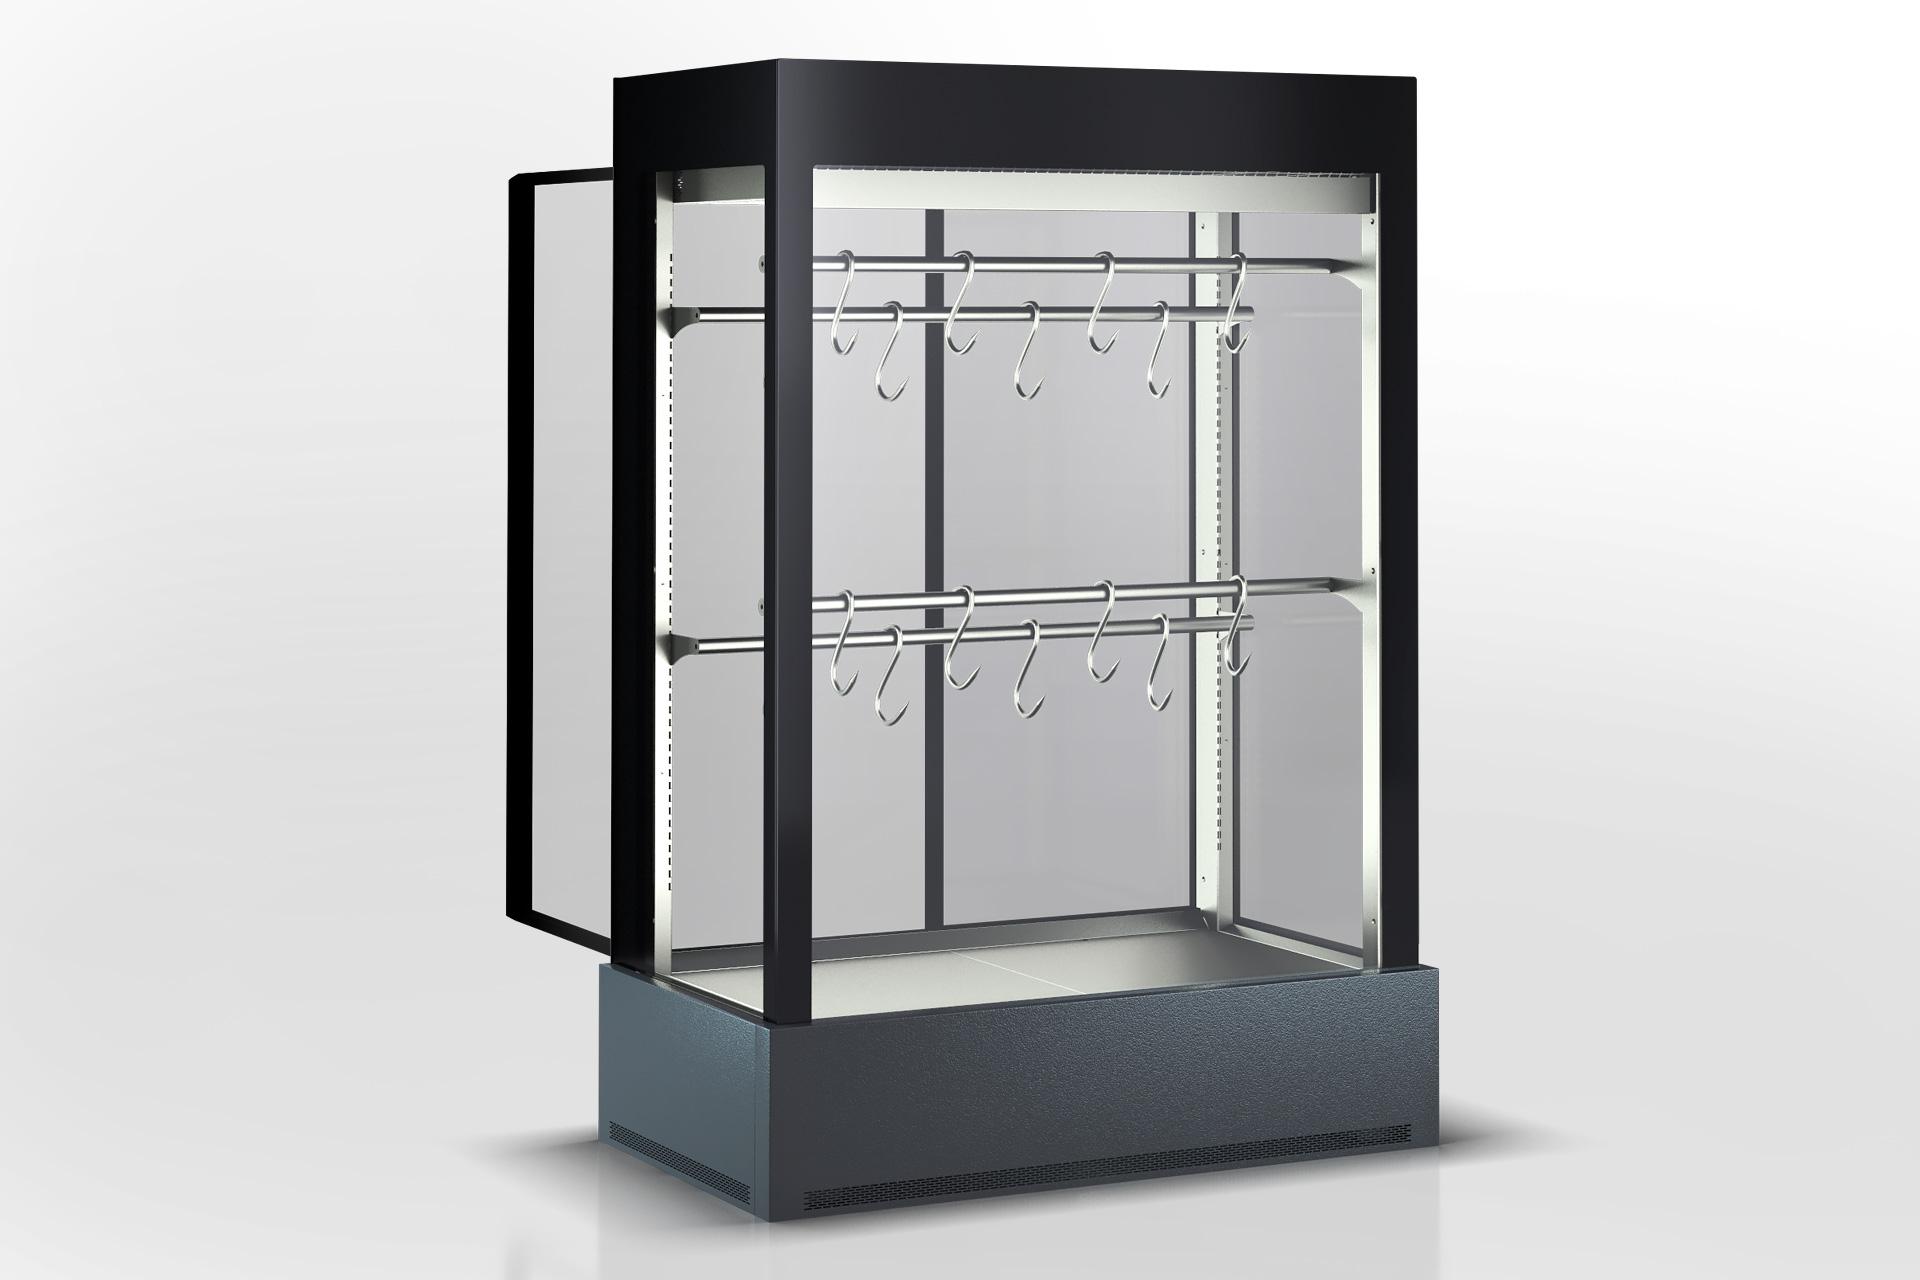 Холодильные шкафы Kansas А4SG 078 meat 2HD - option